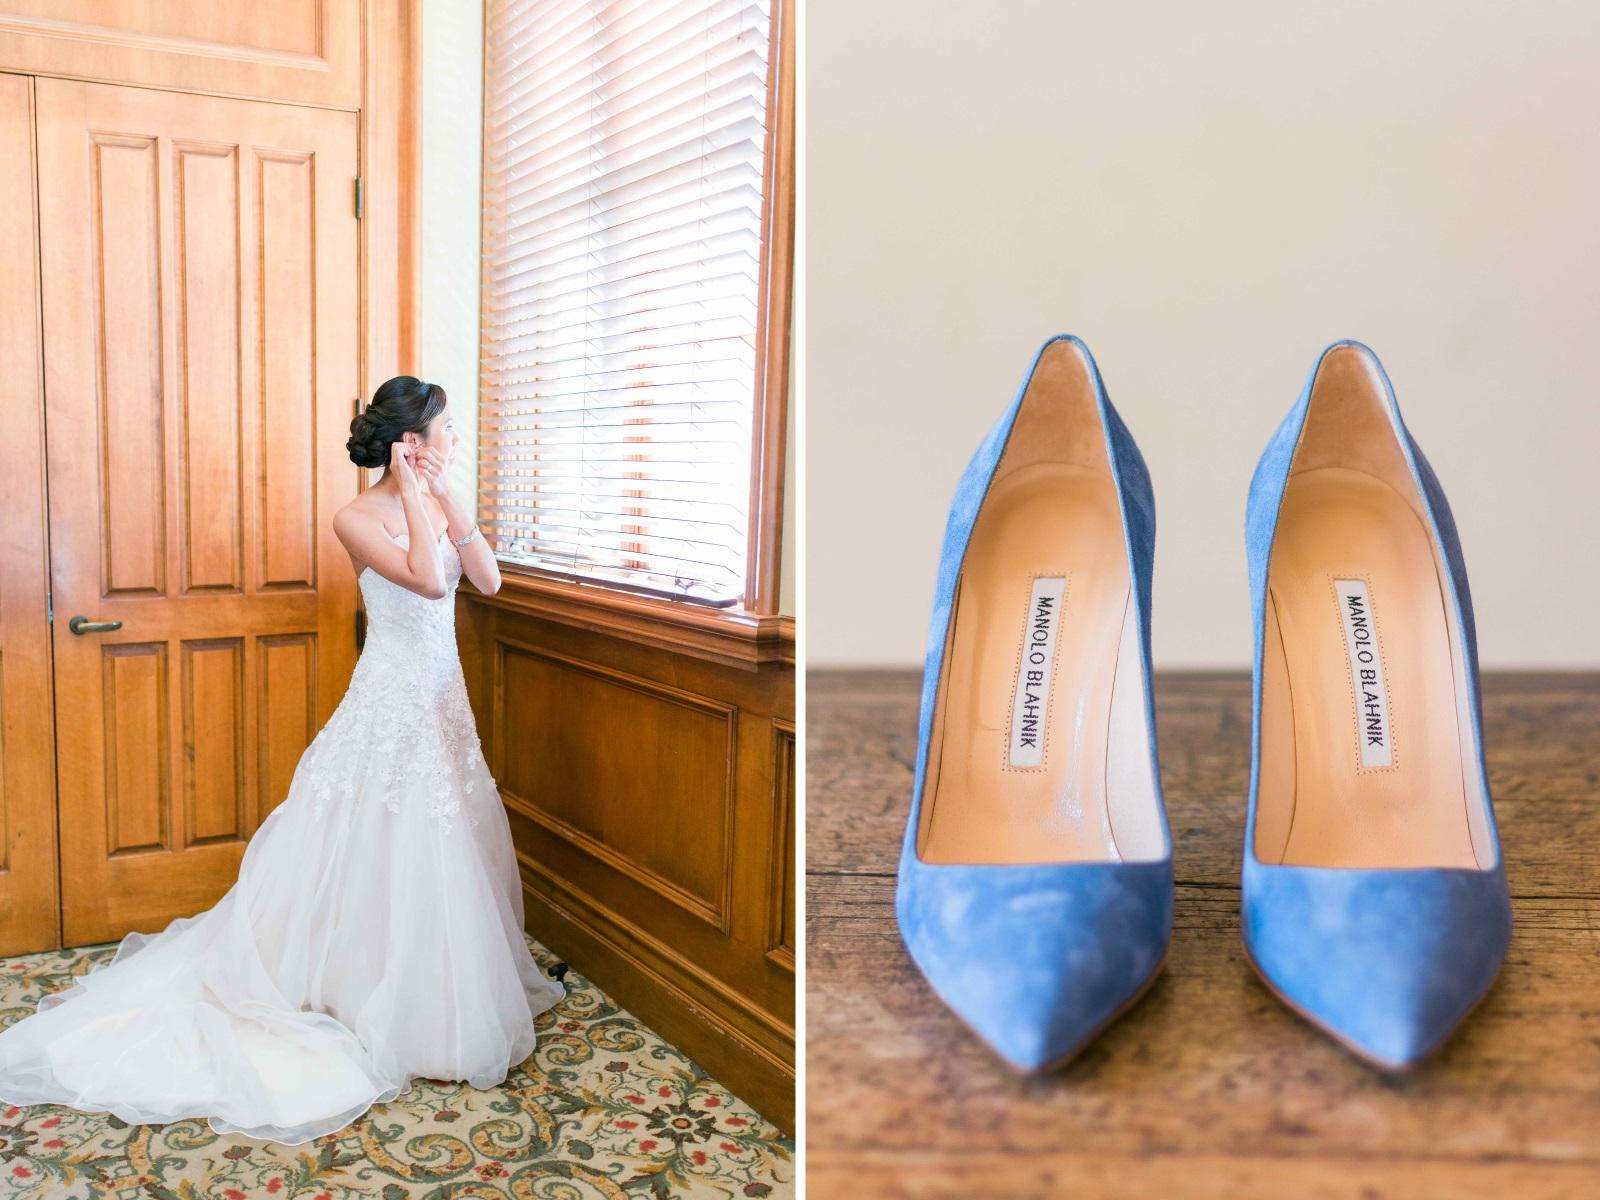 Ruby Hill Wedding Photos by JBJ Pictures - San Francisco Wedding Photographer - Pleasanton Wedding Venue (12.1).jpg